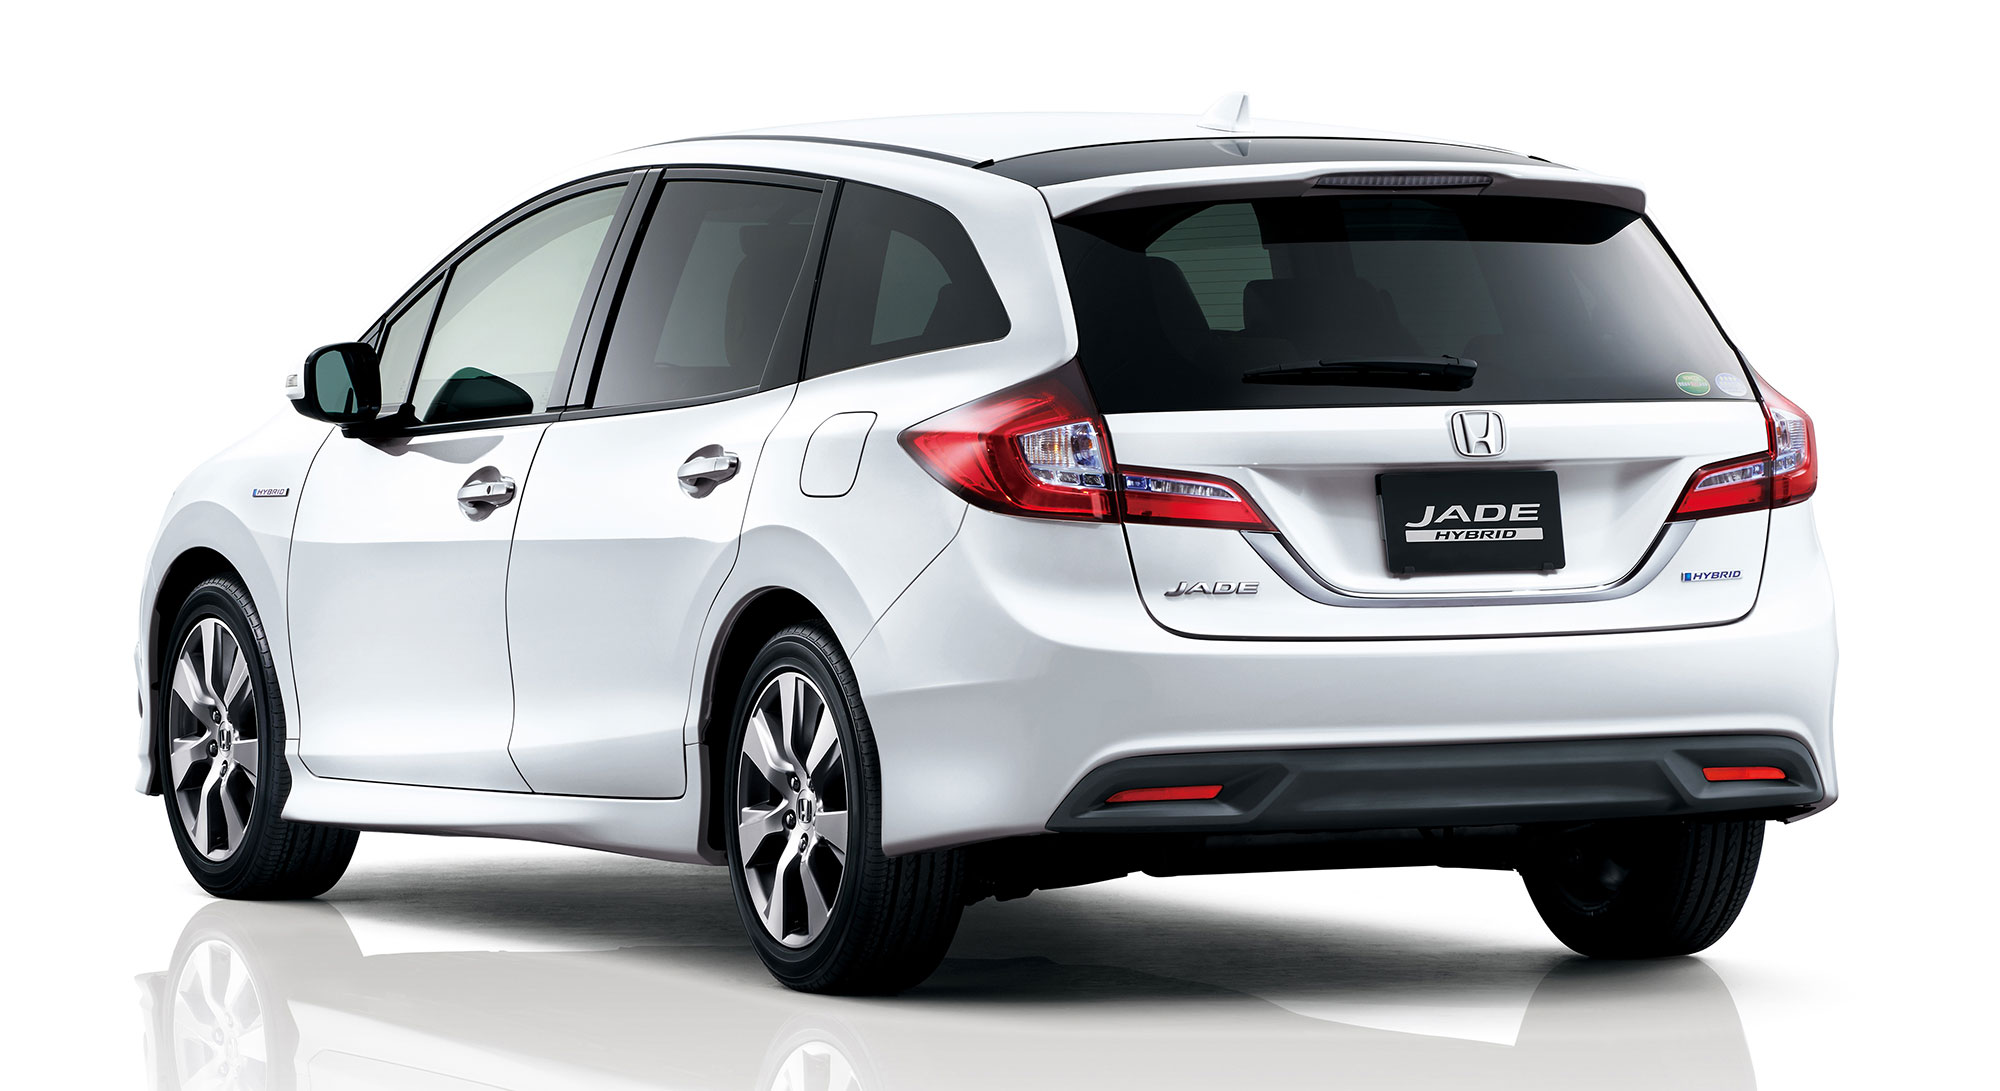 Honda Car Models >> Honda Jade Hybrid – 6-seater MPV launching in Japan Image 301232